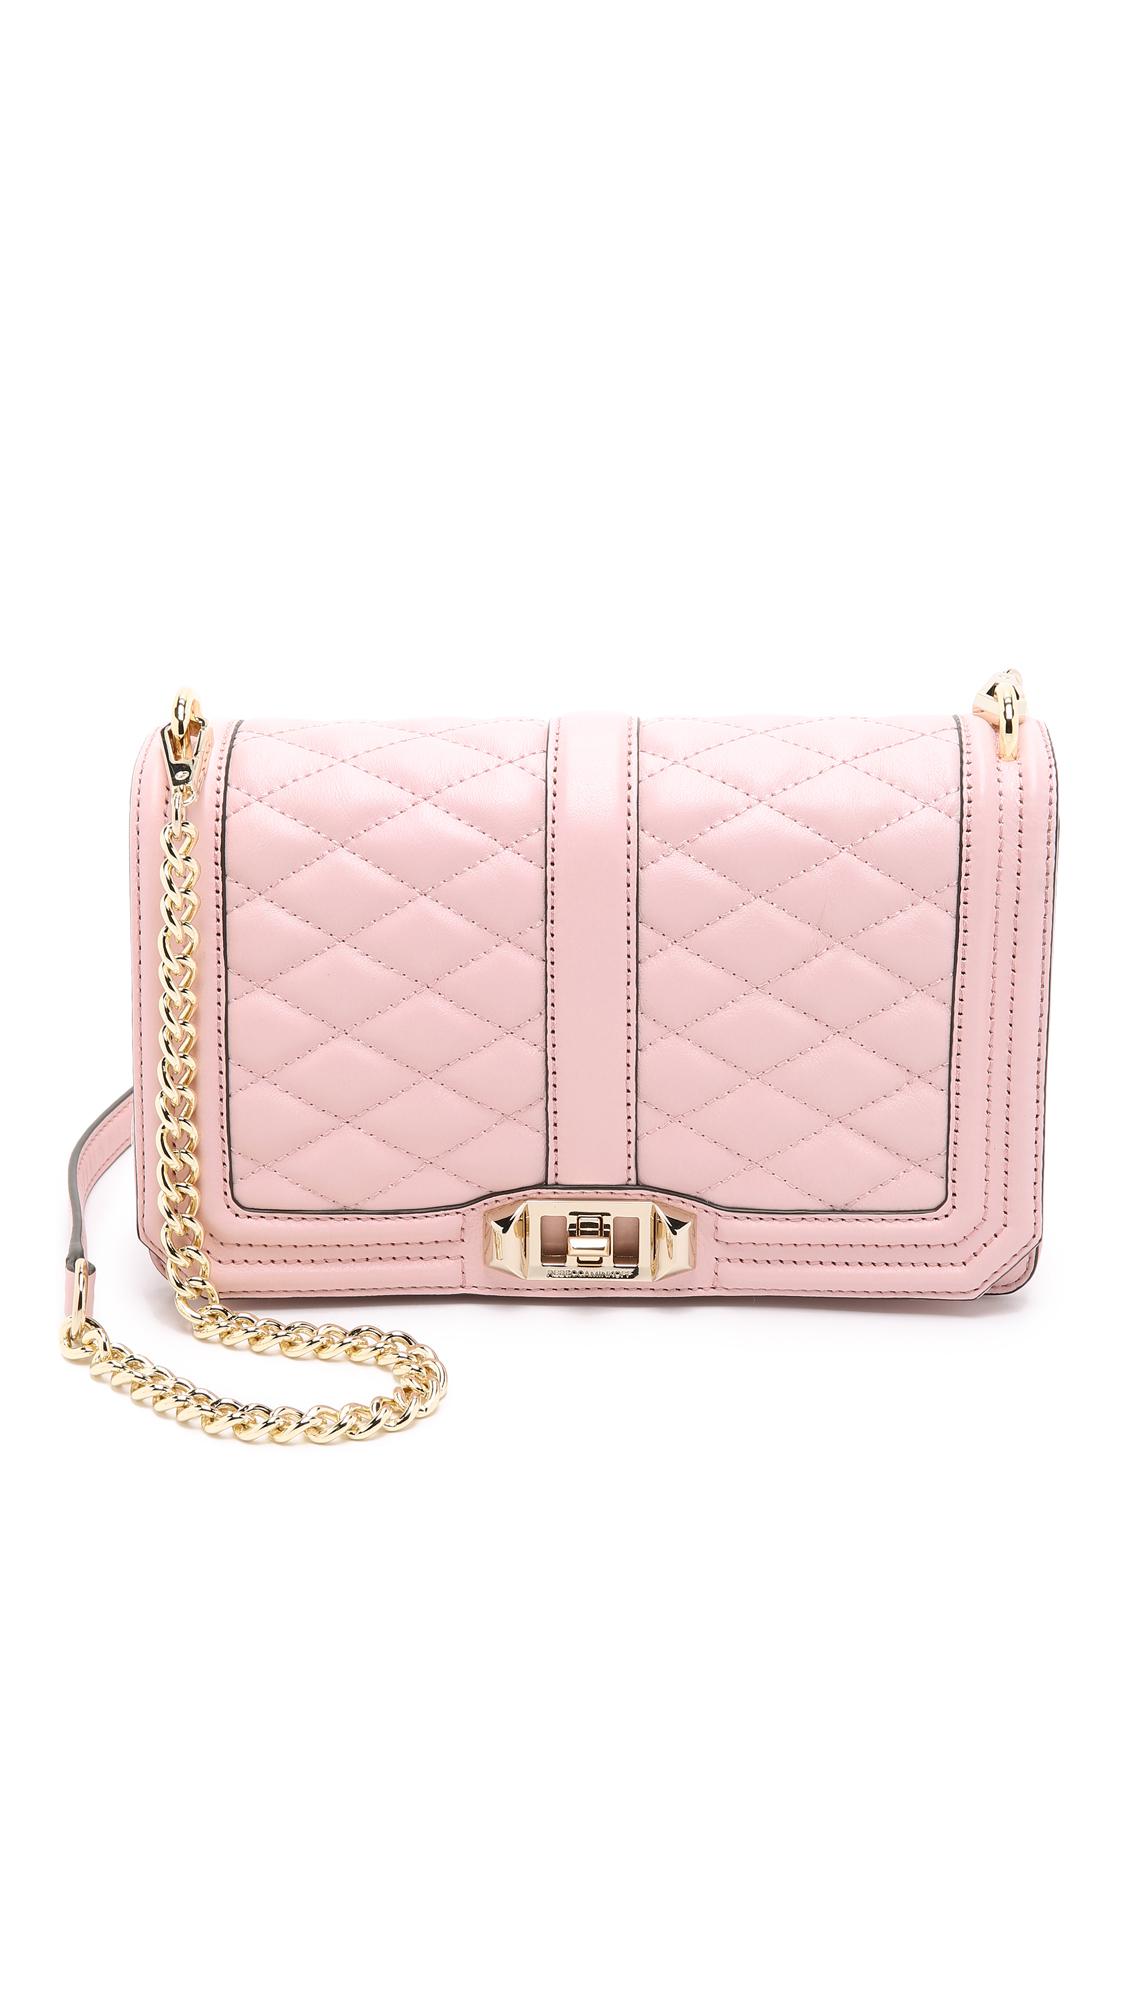 34235c12b5 Rebecca Minkoff Love Cross Body Bag in Pink - Lyst